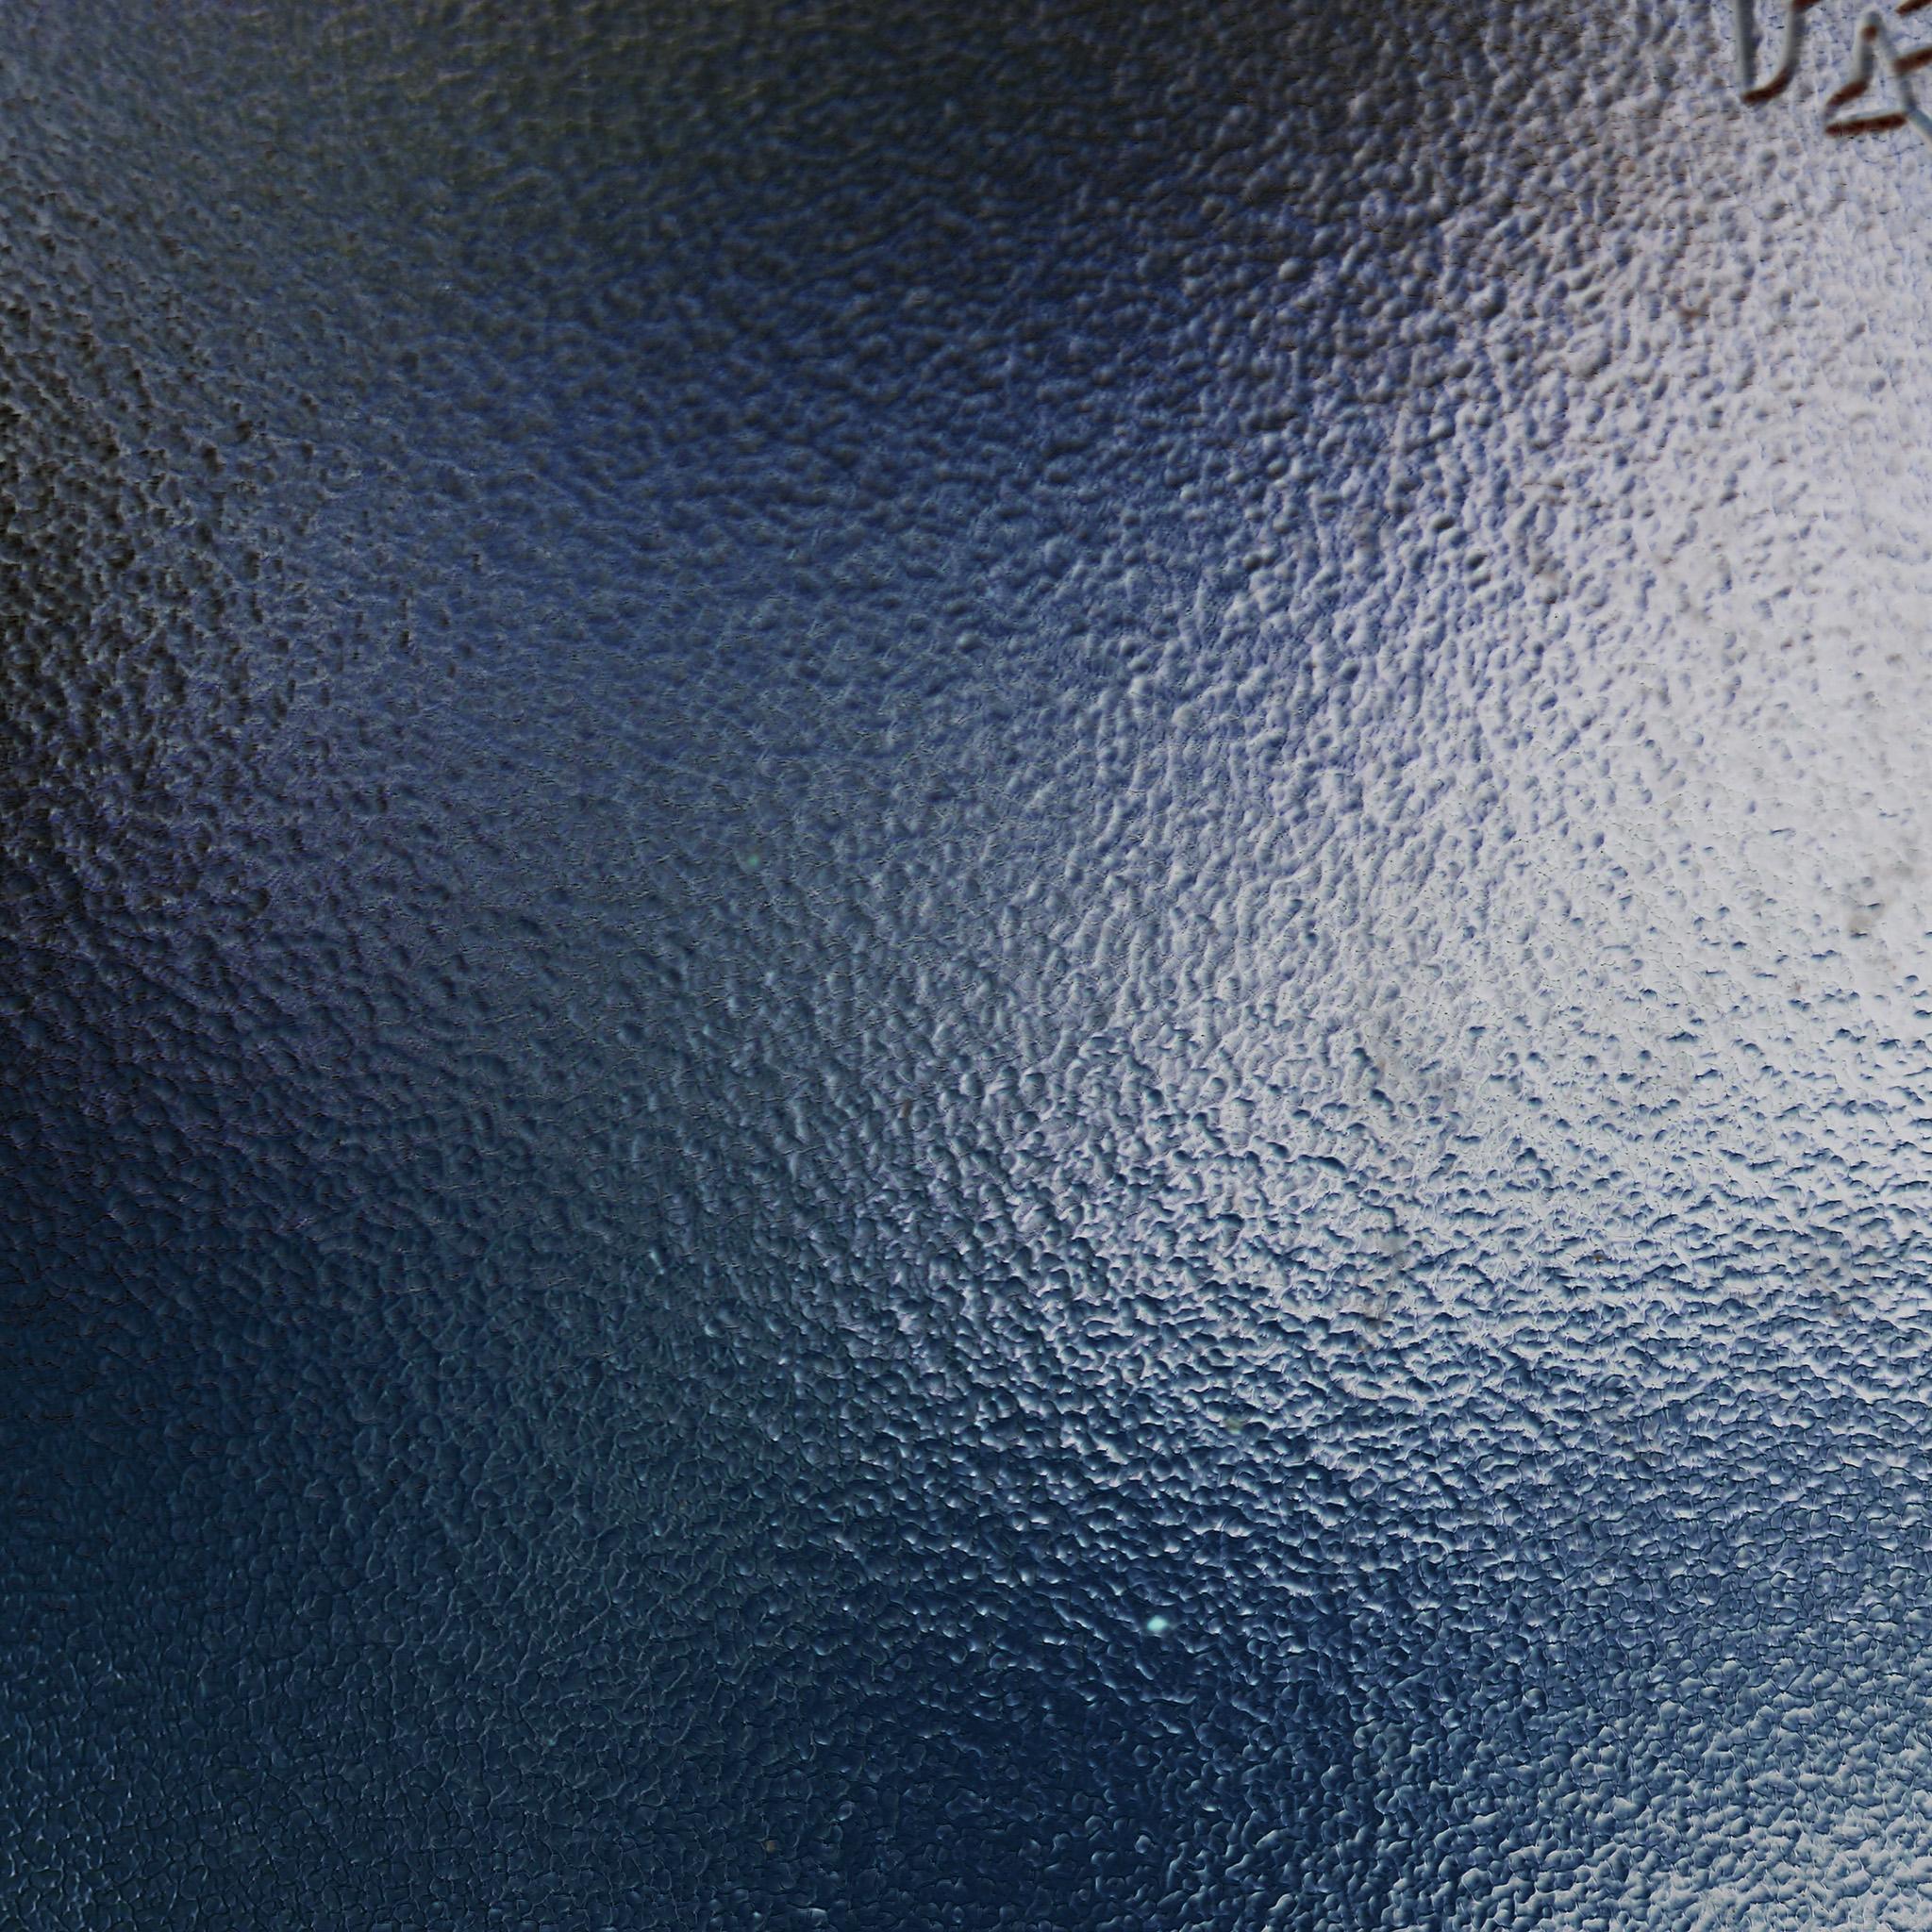 Fall Textures Wallpaper Wallpapers